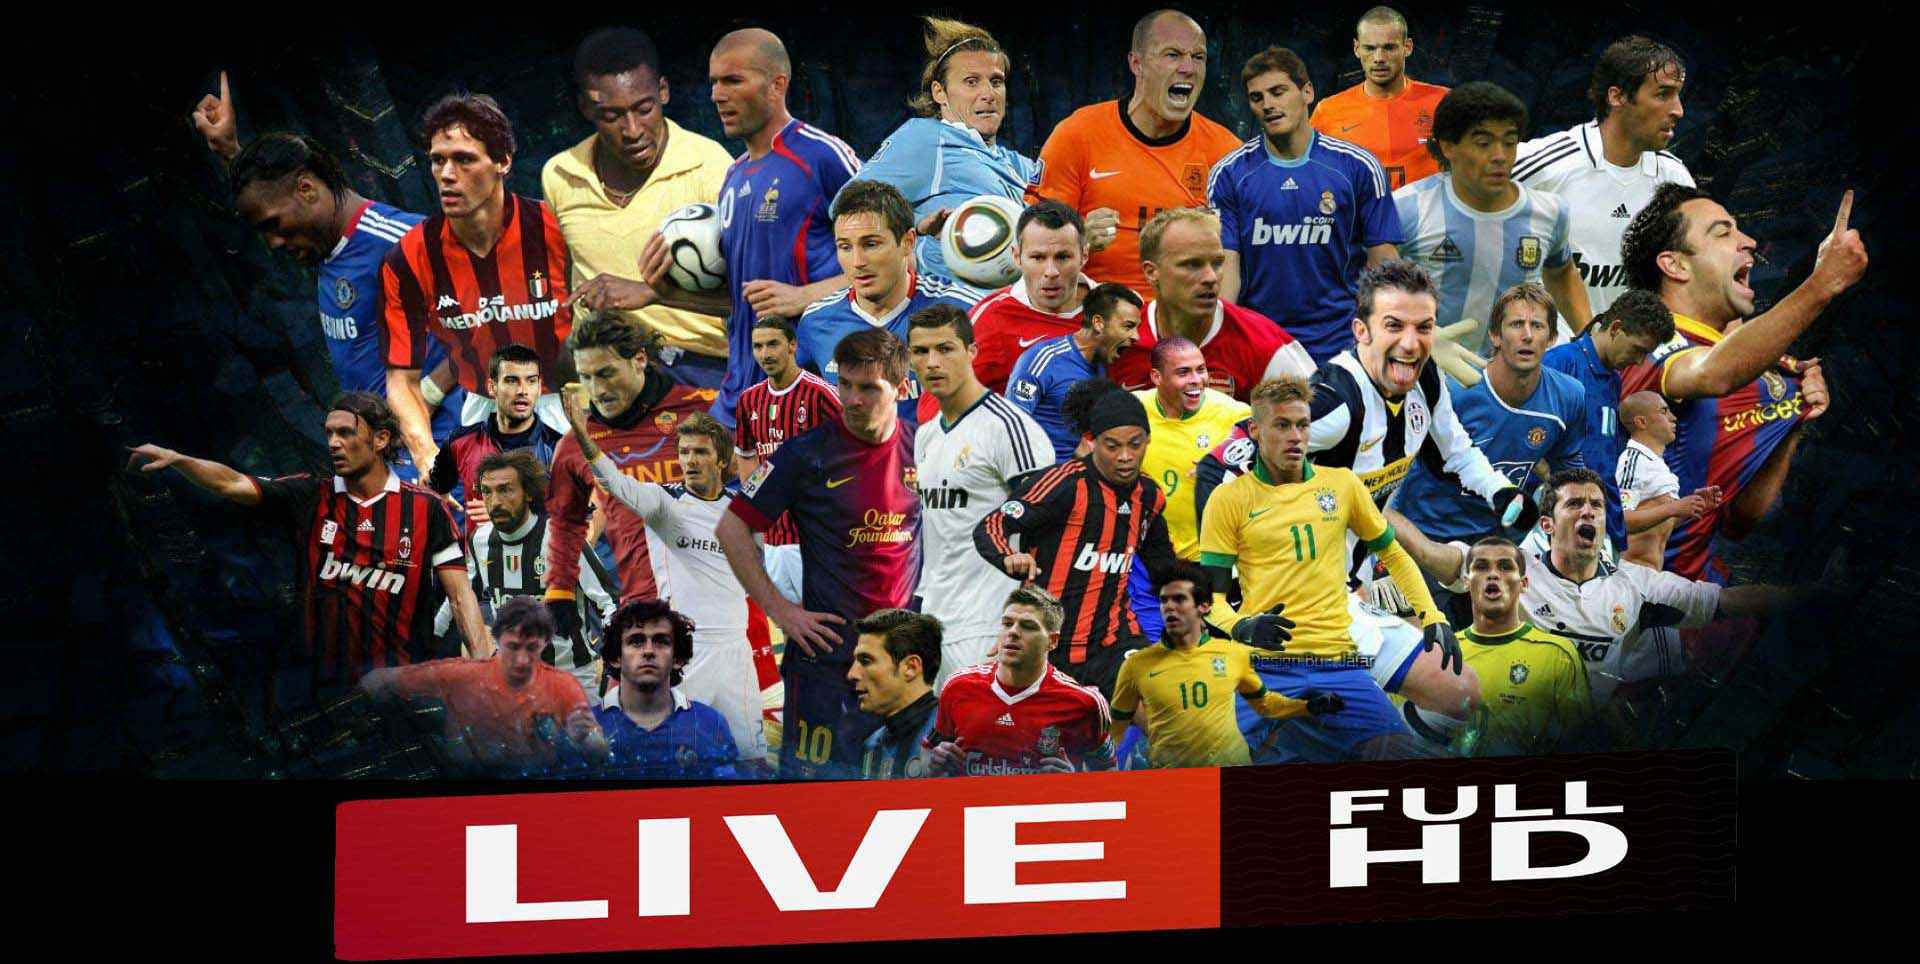 besiktas-vs-benfica-champions-league-live